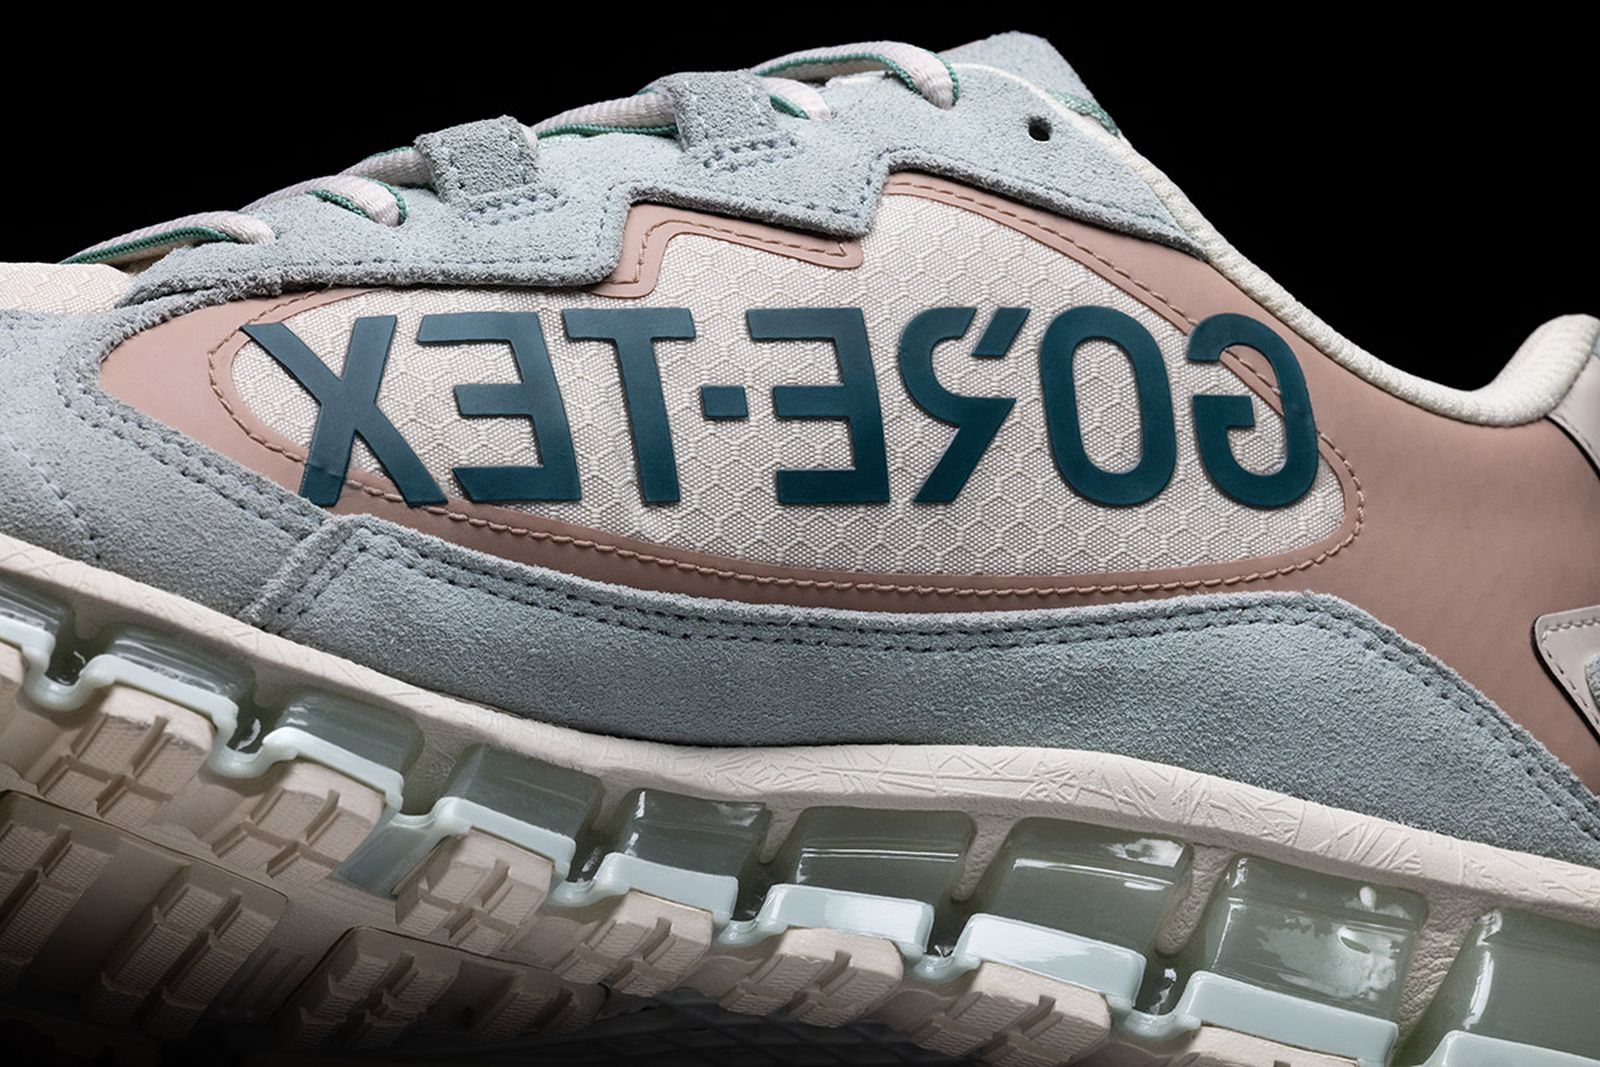 asics gel kayano 5 360 gore tex release date price product ASICS GEL-KAYANO 5 360 gore-tex